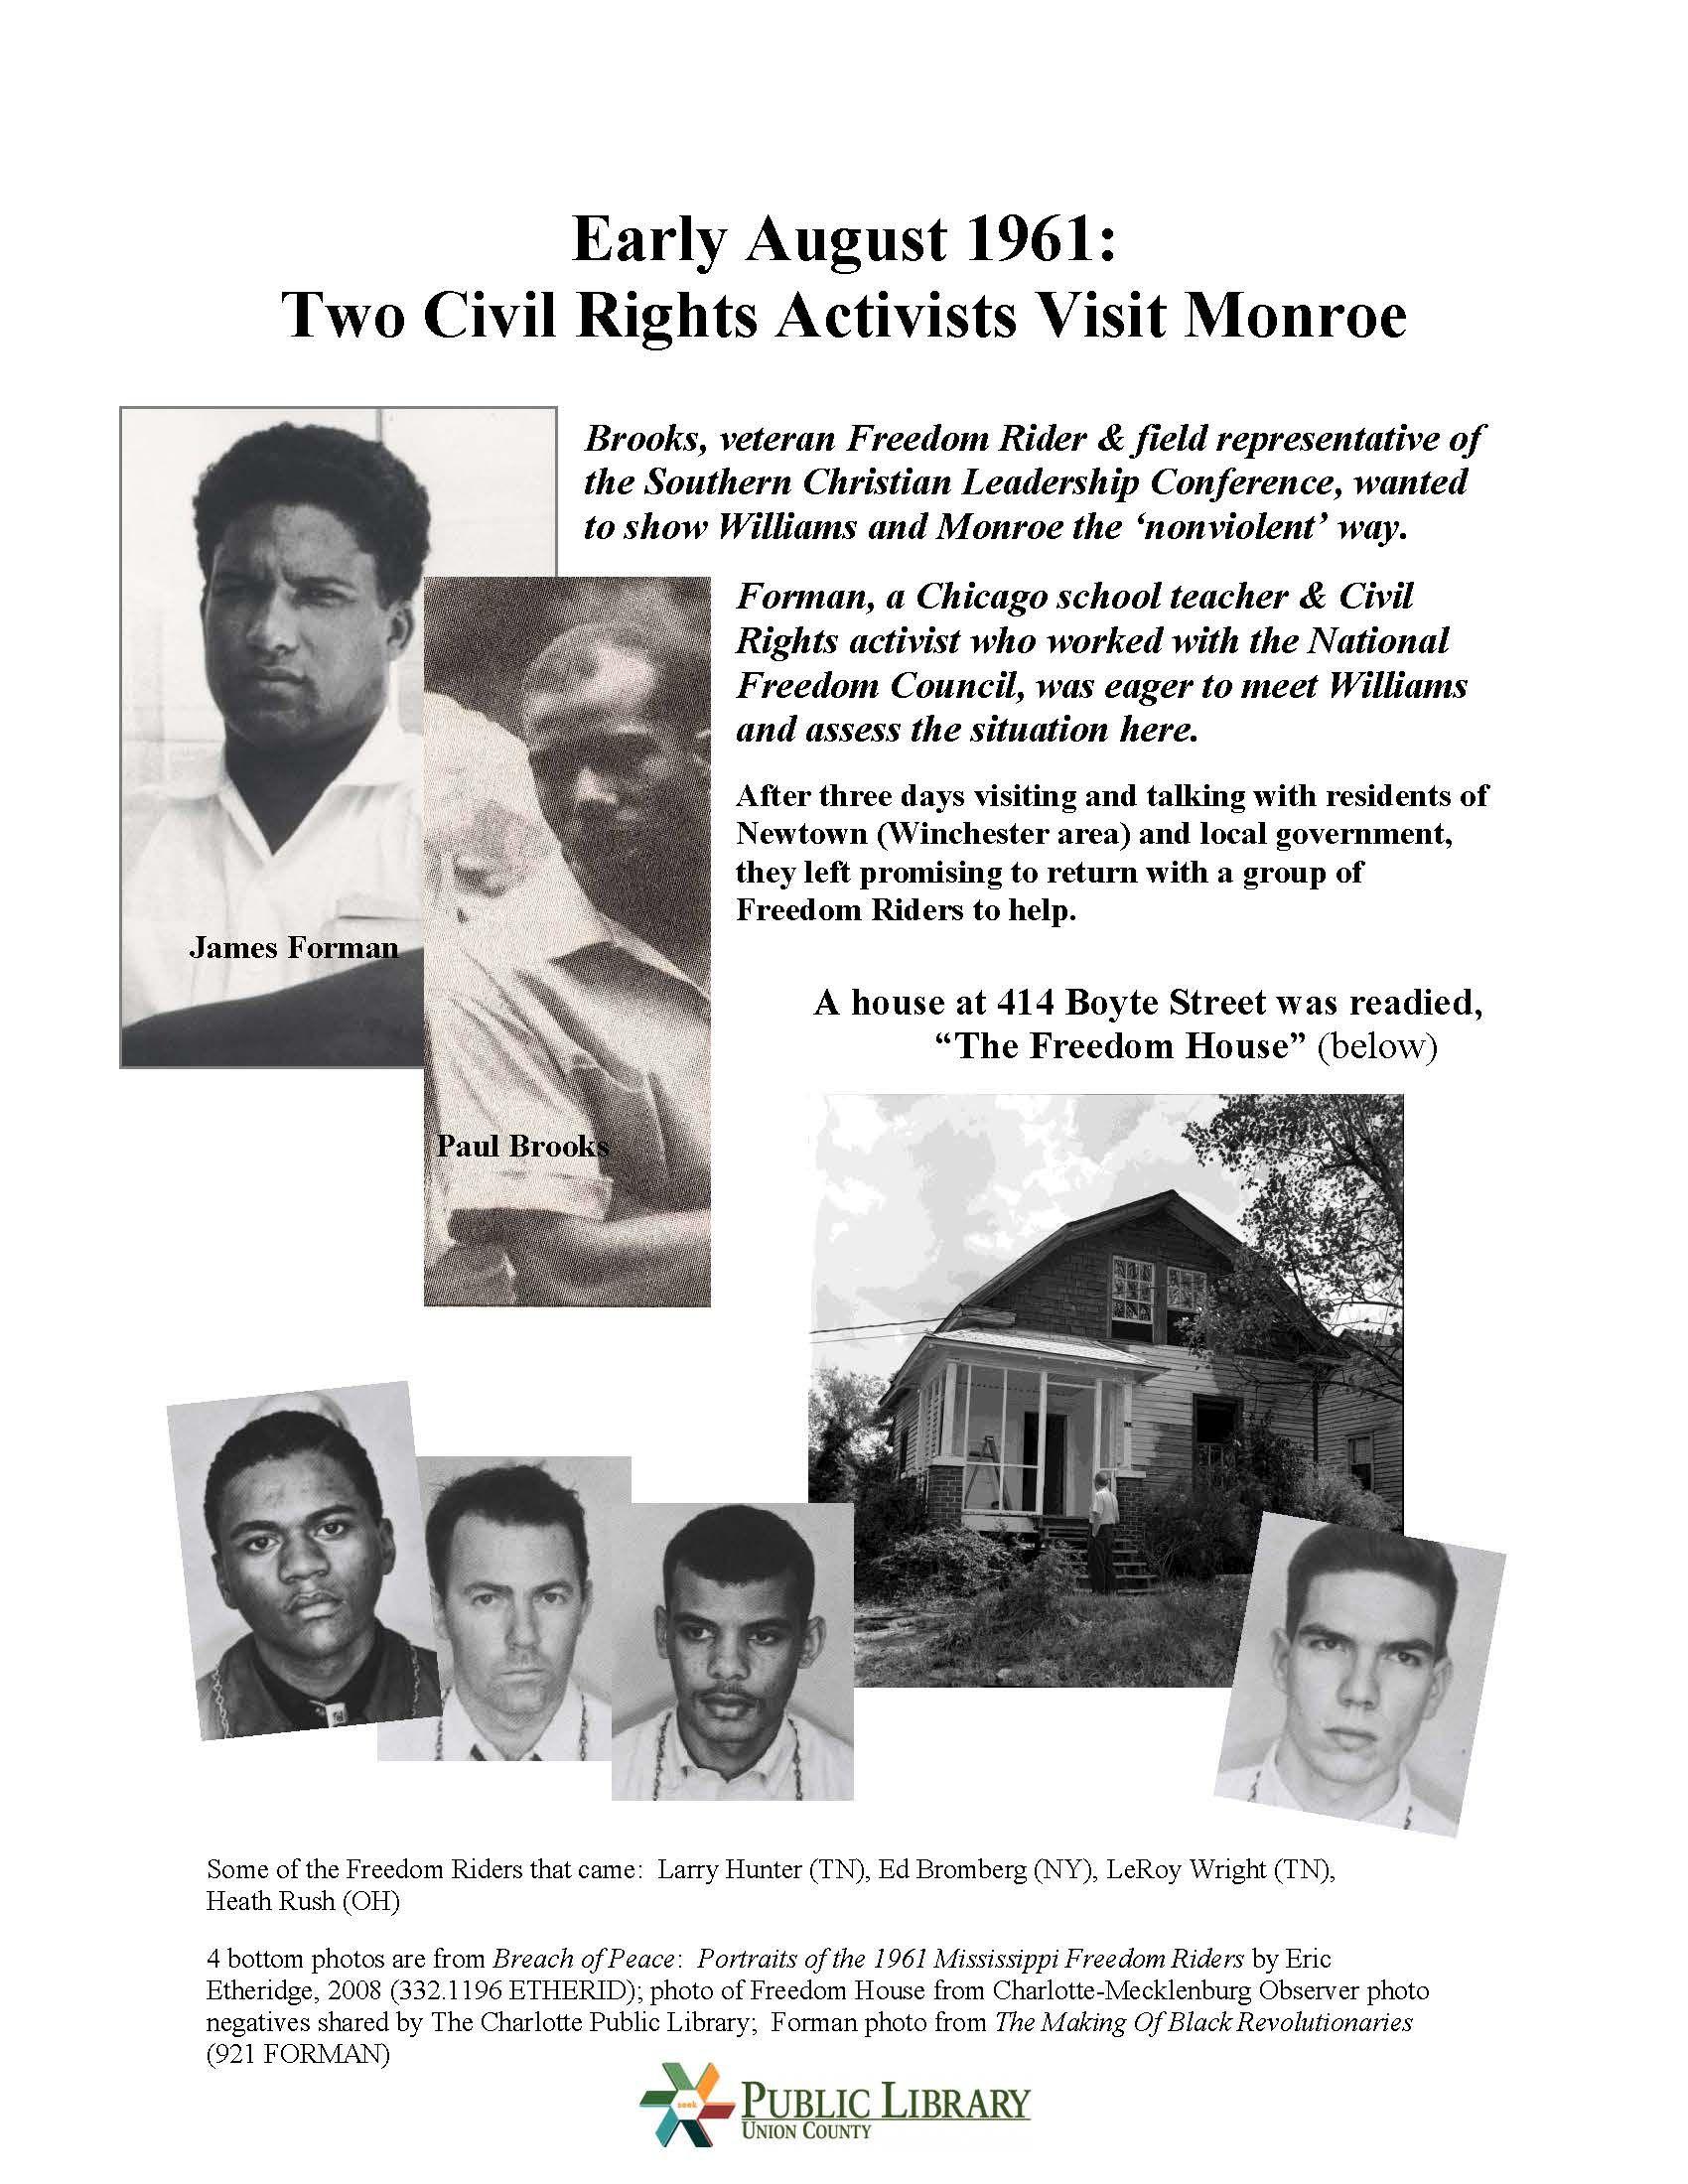 Freedomridersmonroenc Poster 5 Of 16 Created For